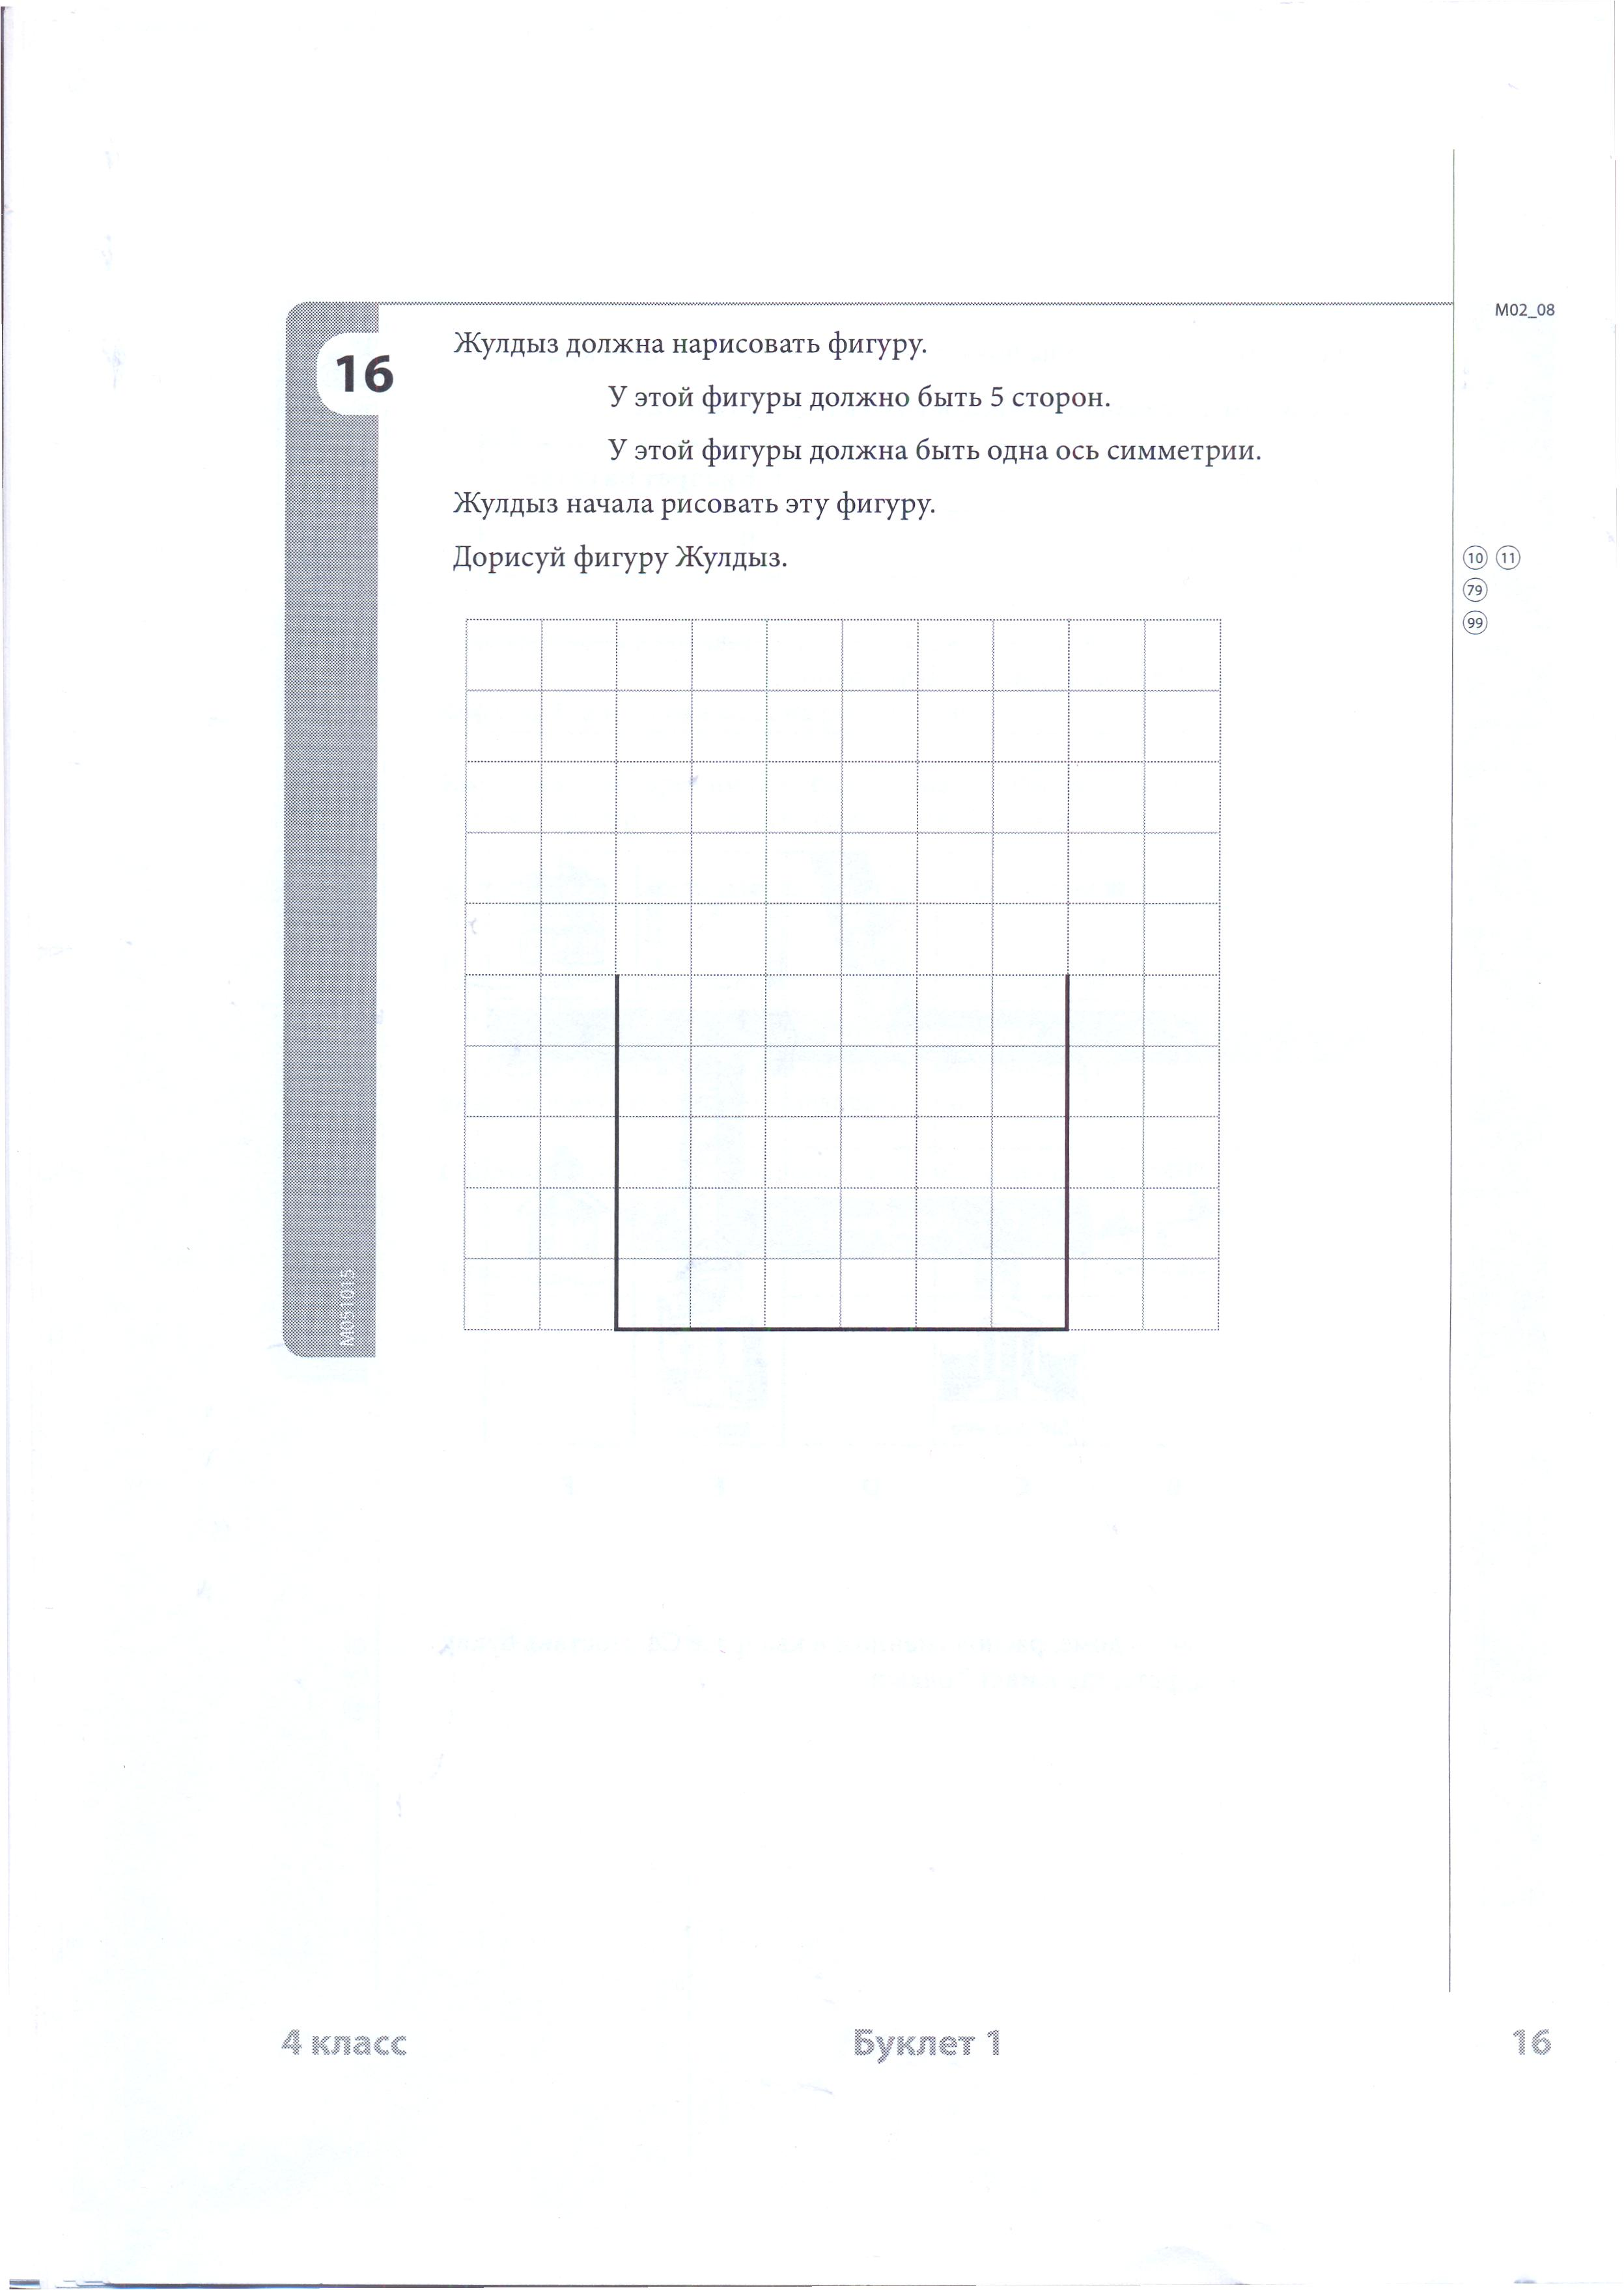 H:\Доклад ТИМСС Алматы 8.04.2014\TIMSS MATEM 4 kl_1 var\Matematic_4 kl_1 var0013.jpg